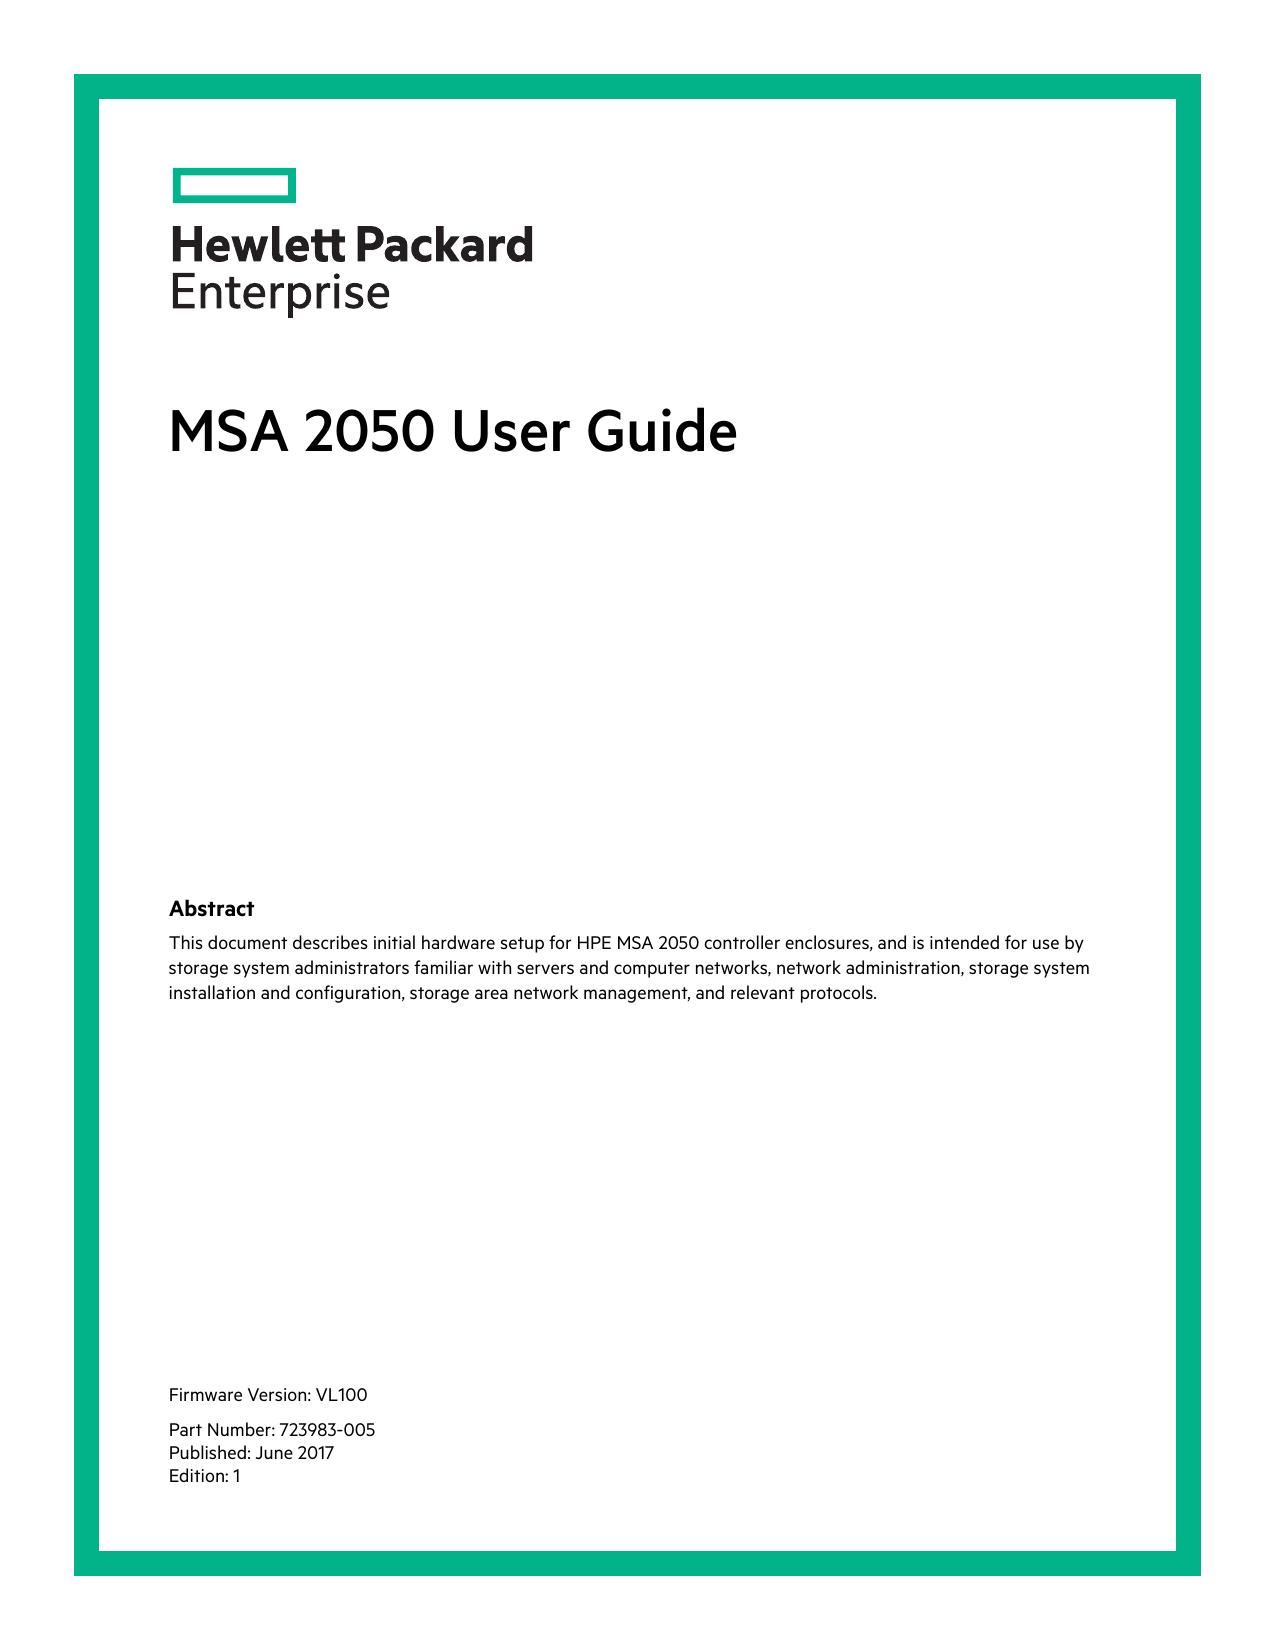 HPE MSA 2050 User Guide (VL100) | manualzz com